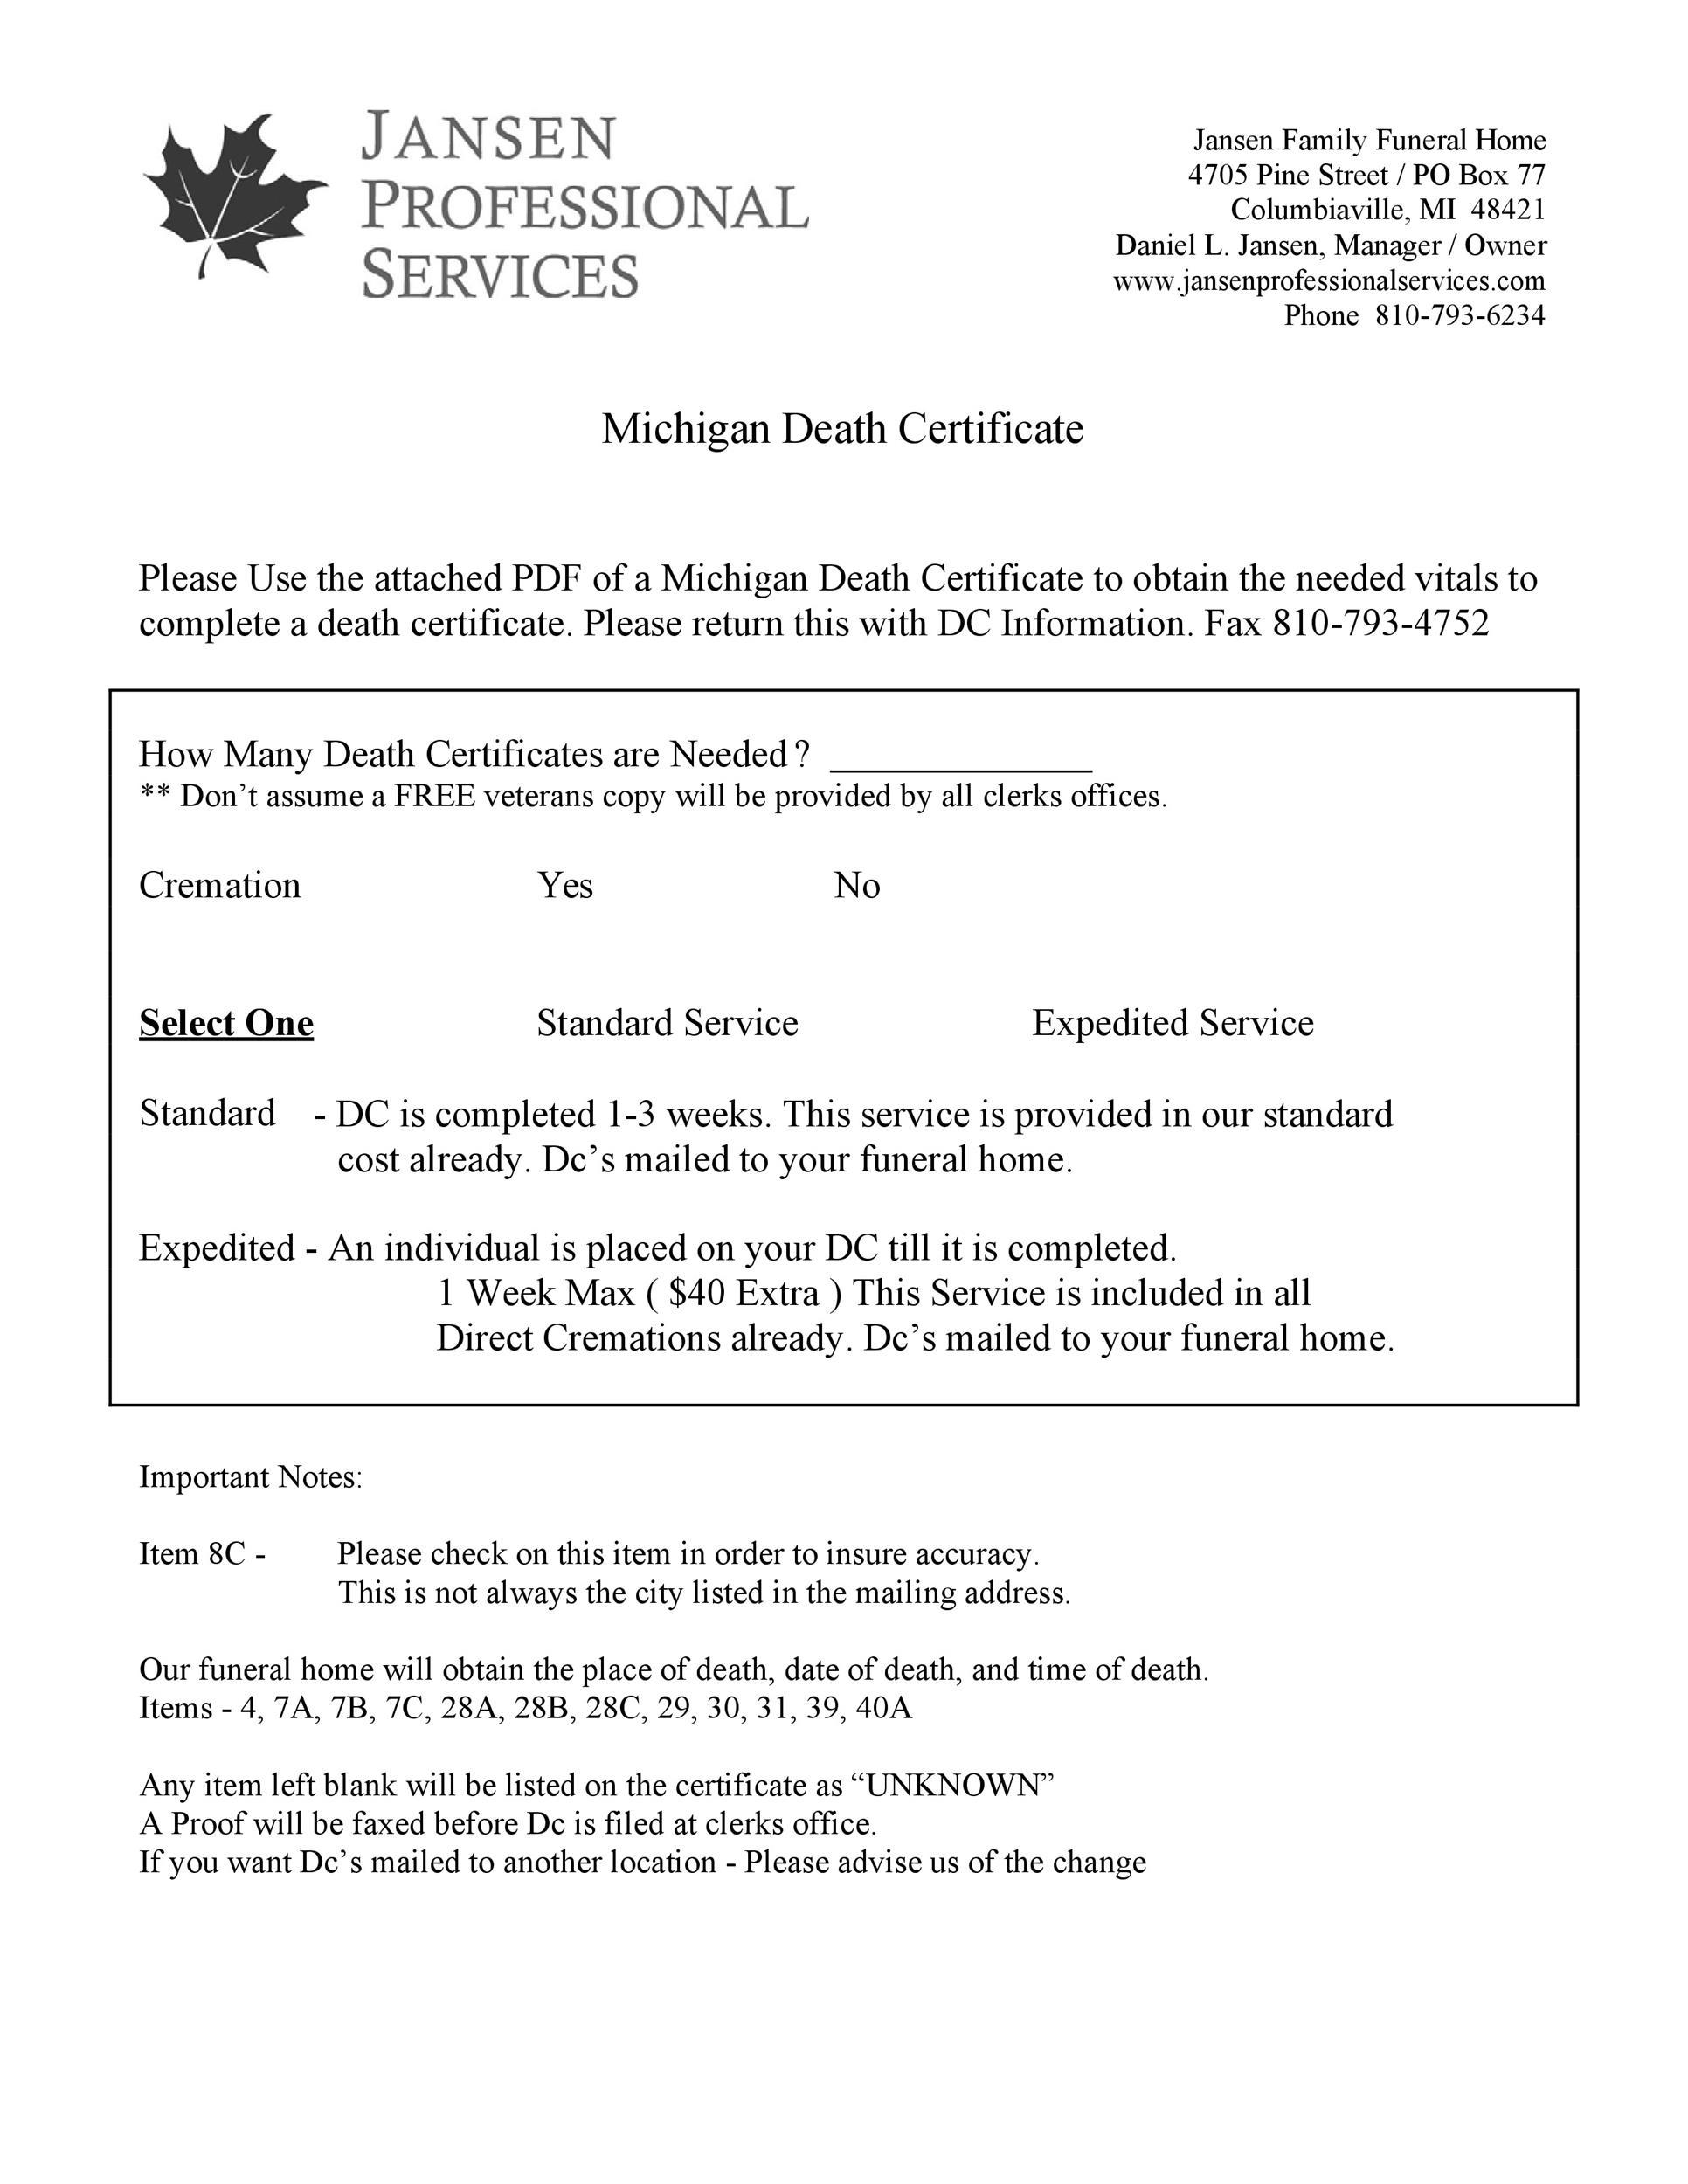 Free death certificate template 13